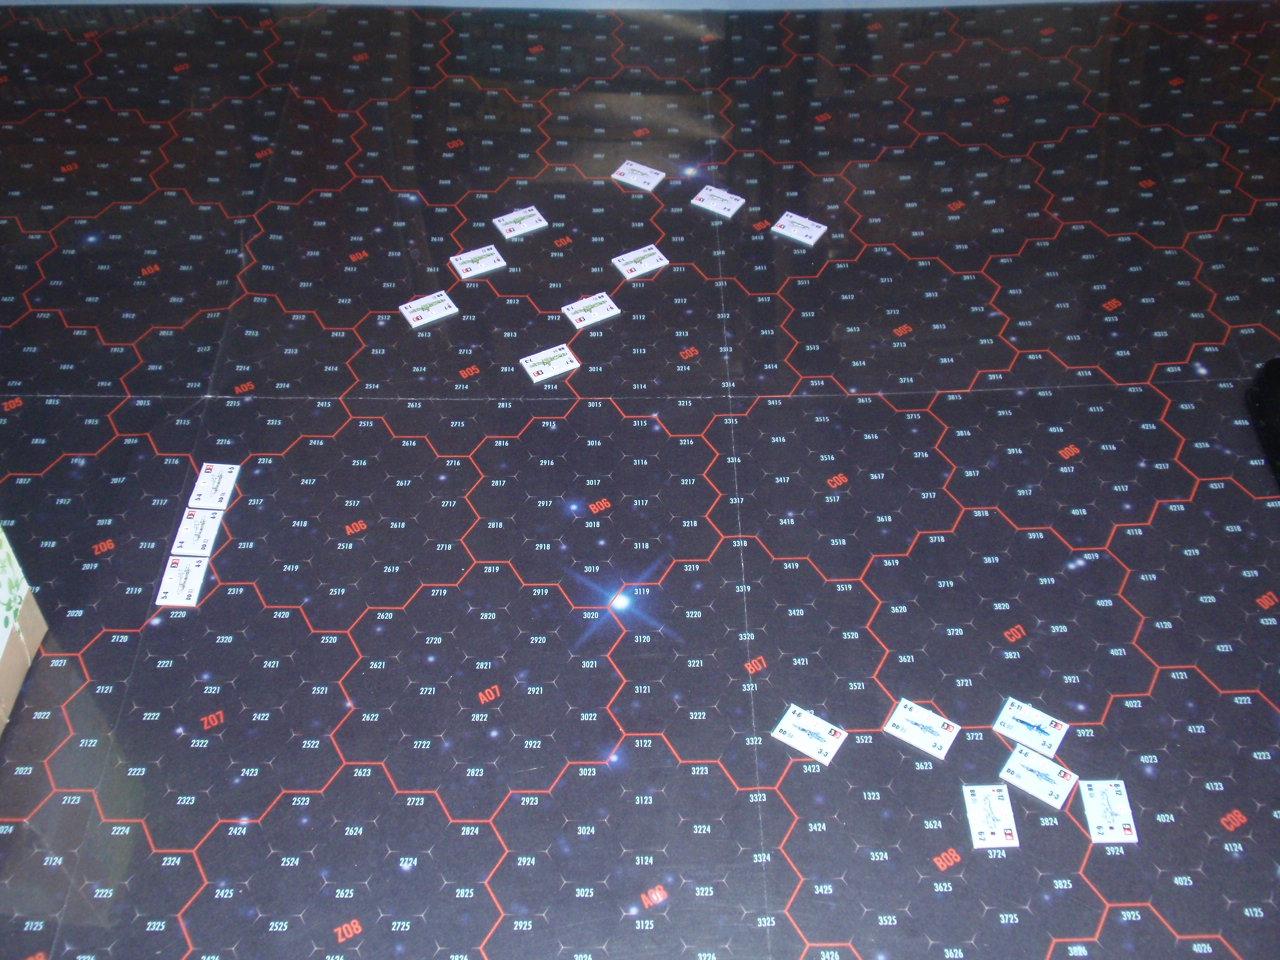 Bonsai Games「アイアン・デブリ・システム」よりシナリオ「全滅!ヒペリオン艦隊」をソロプレイ②_b0162202_19342683.jpg